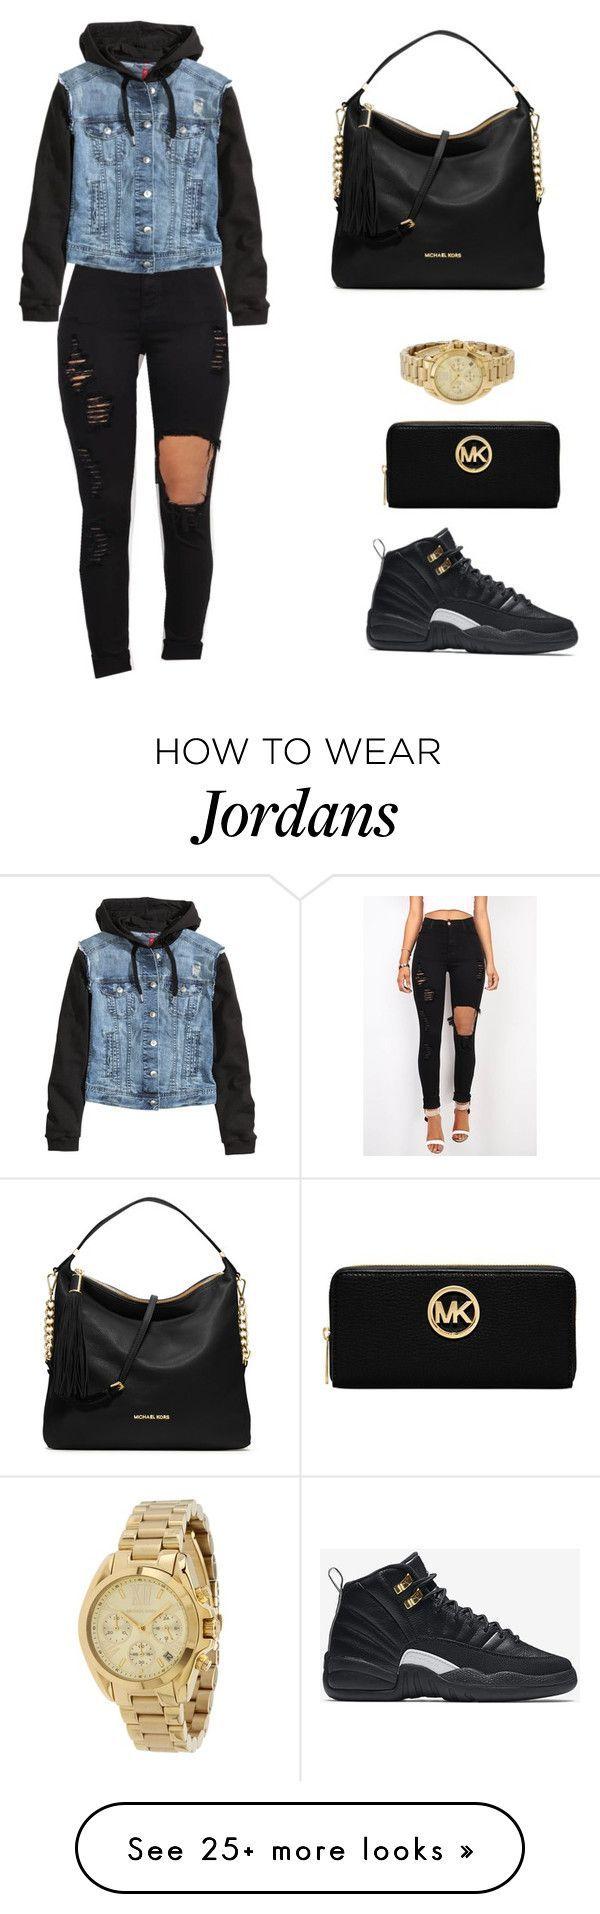 8ac747063c471 cheapest jordan true flight outfit jordans polyvore 1dd99 85fcd